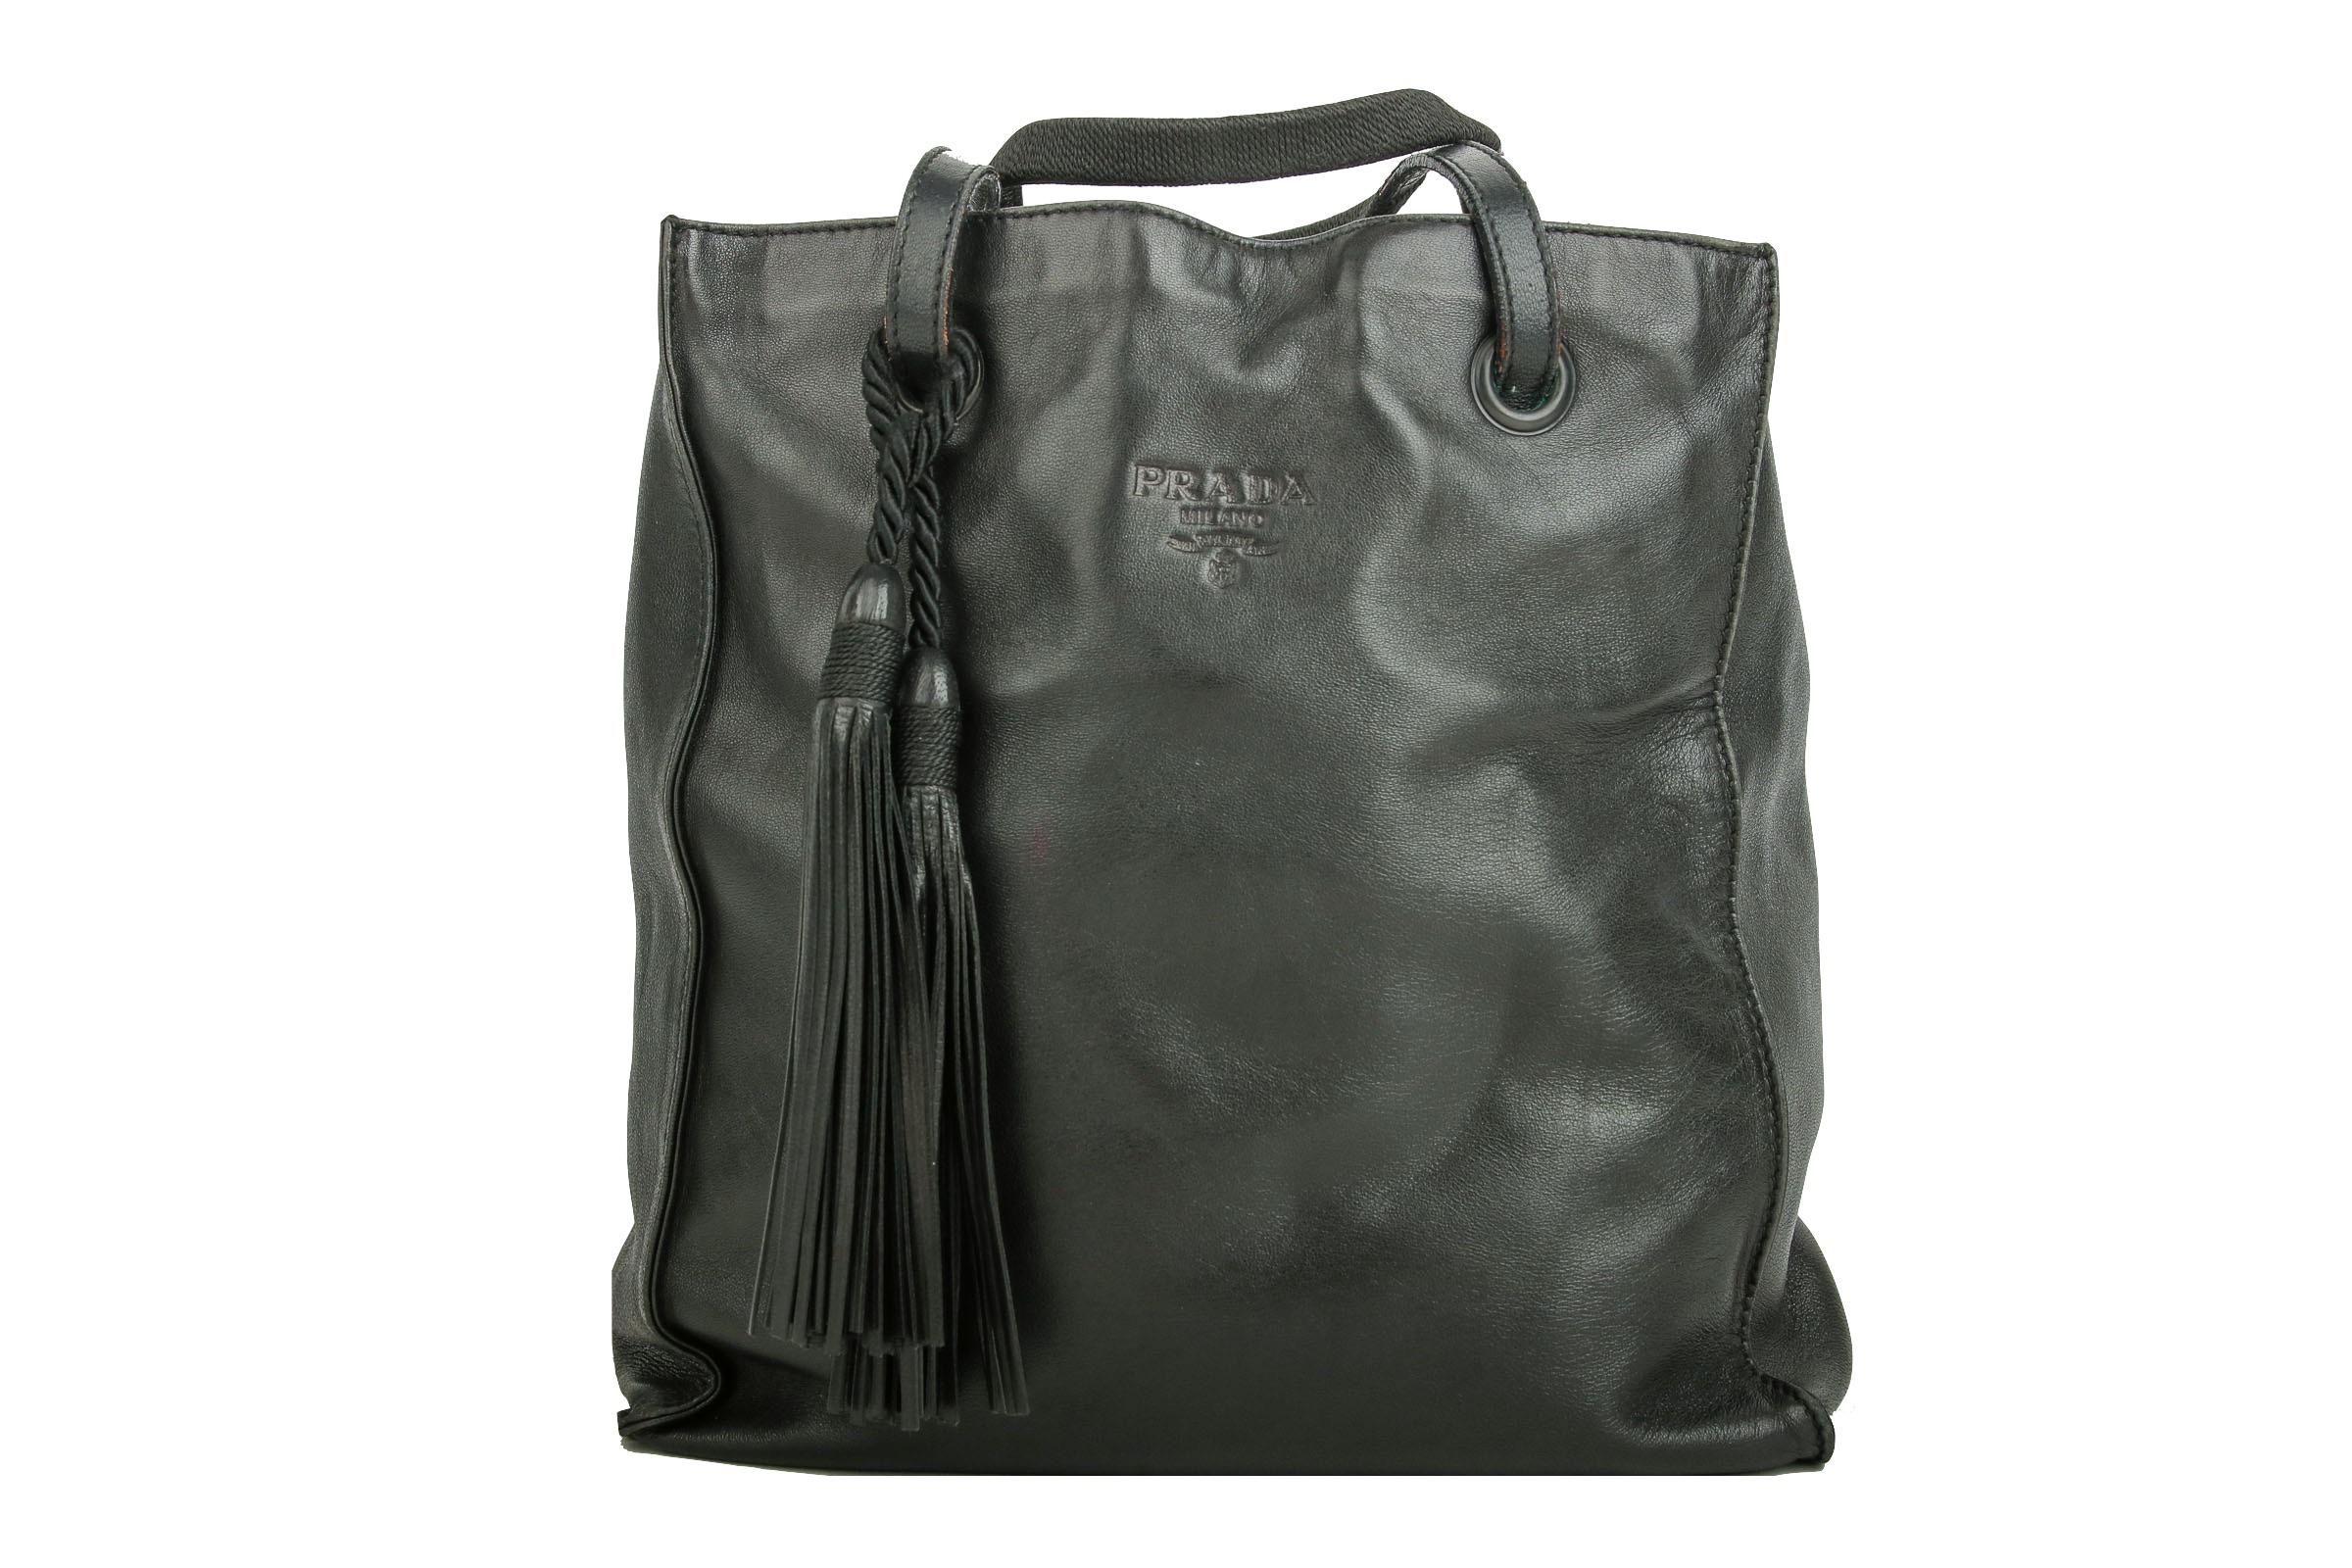 609c6d64214e6 Prada Handtaschen   Accessoires